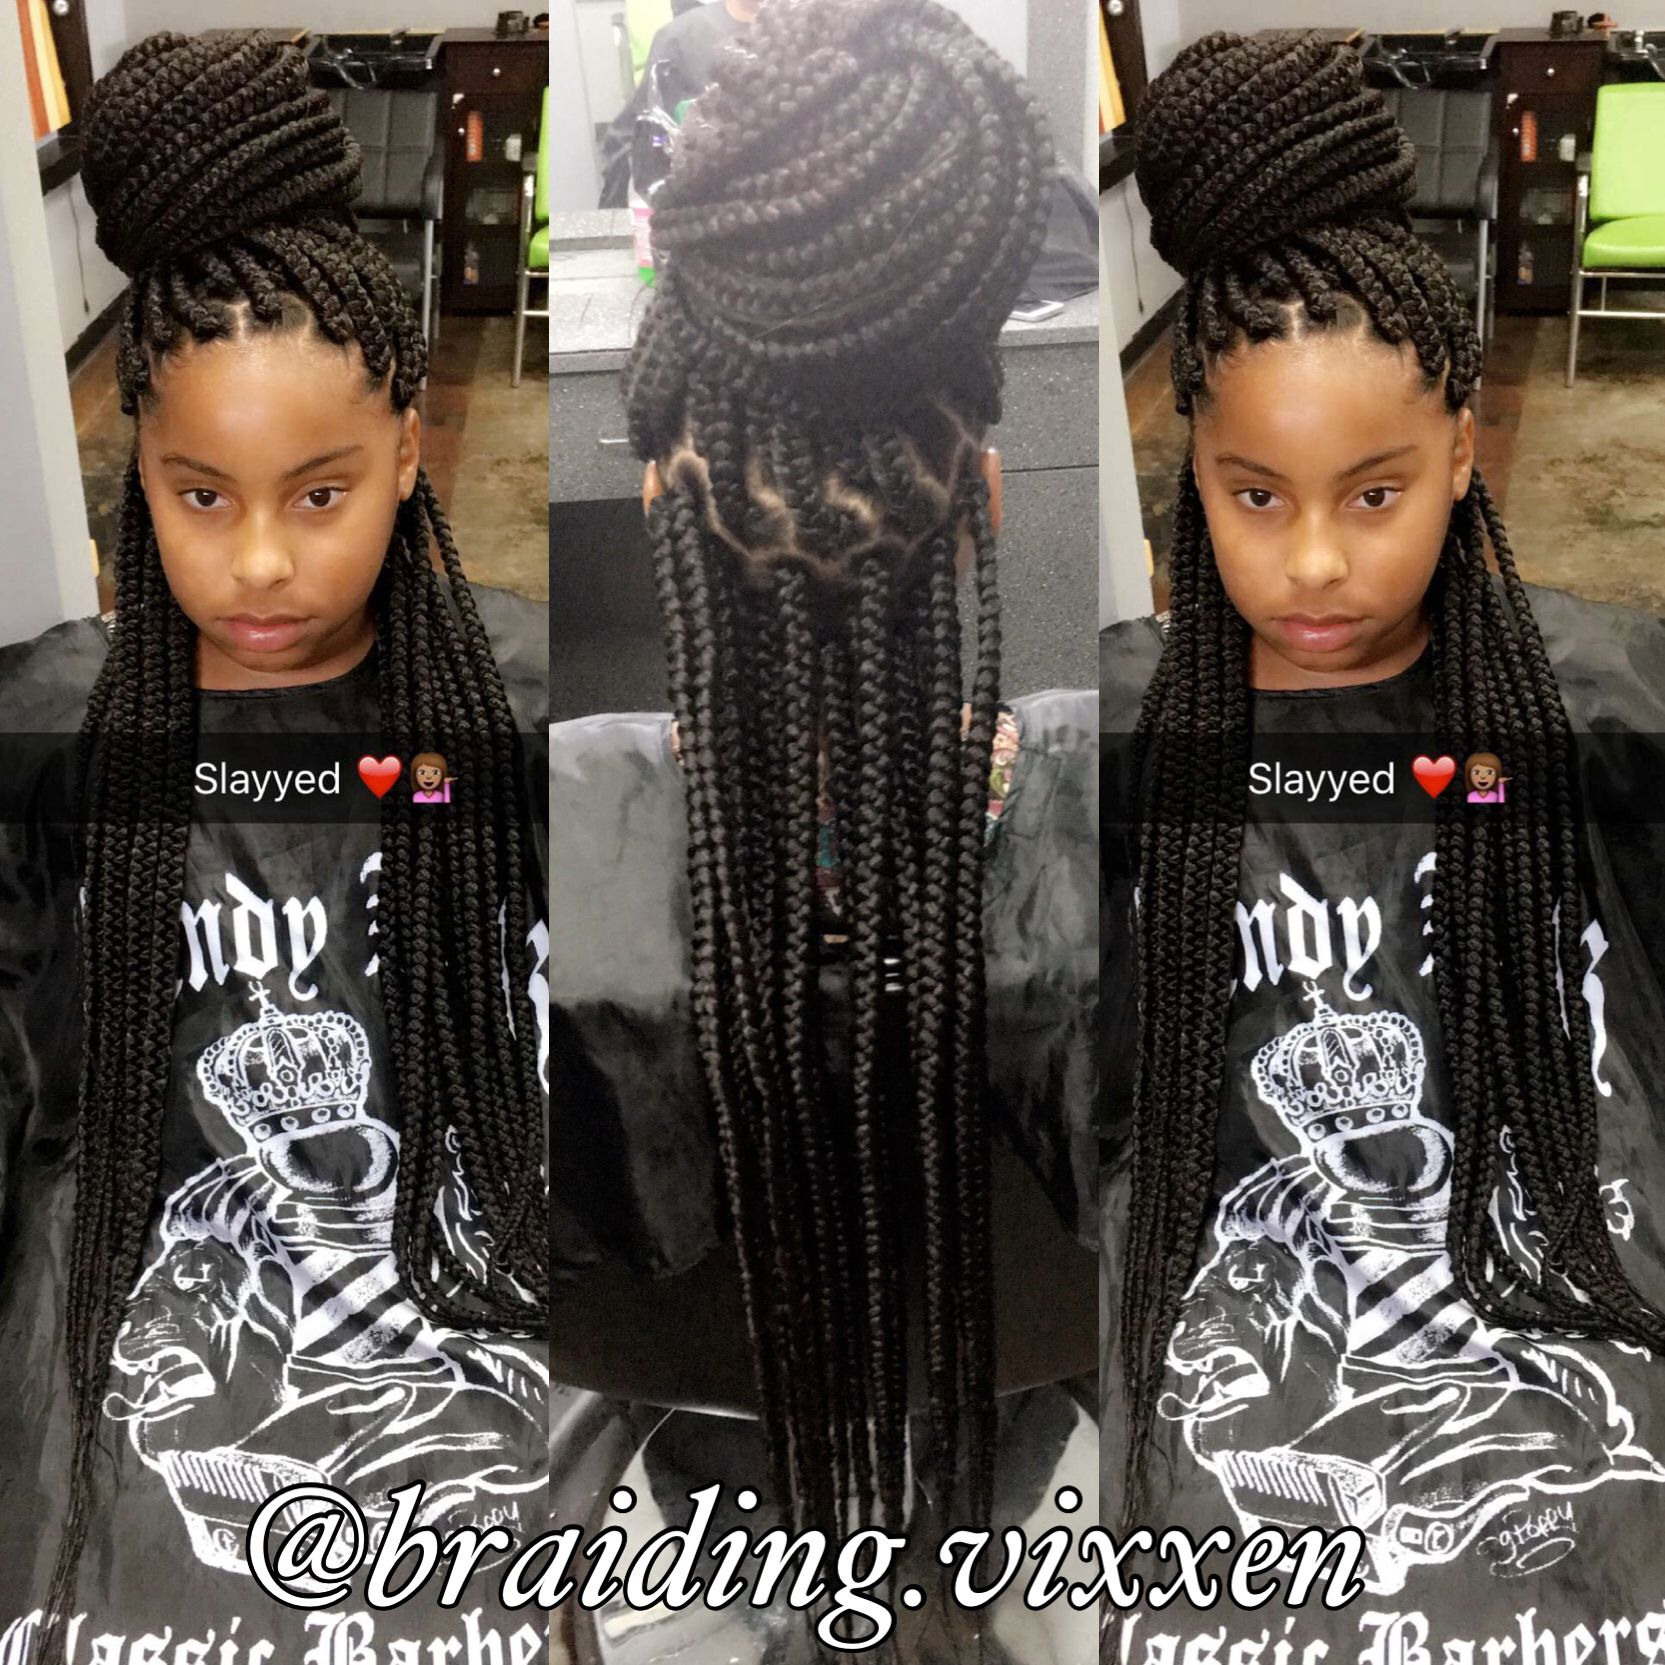 db2fac7e30c340c83165bafb12d81ee8 - How Short Can Your Hair Be To Get Box Braids